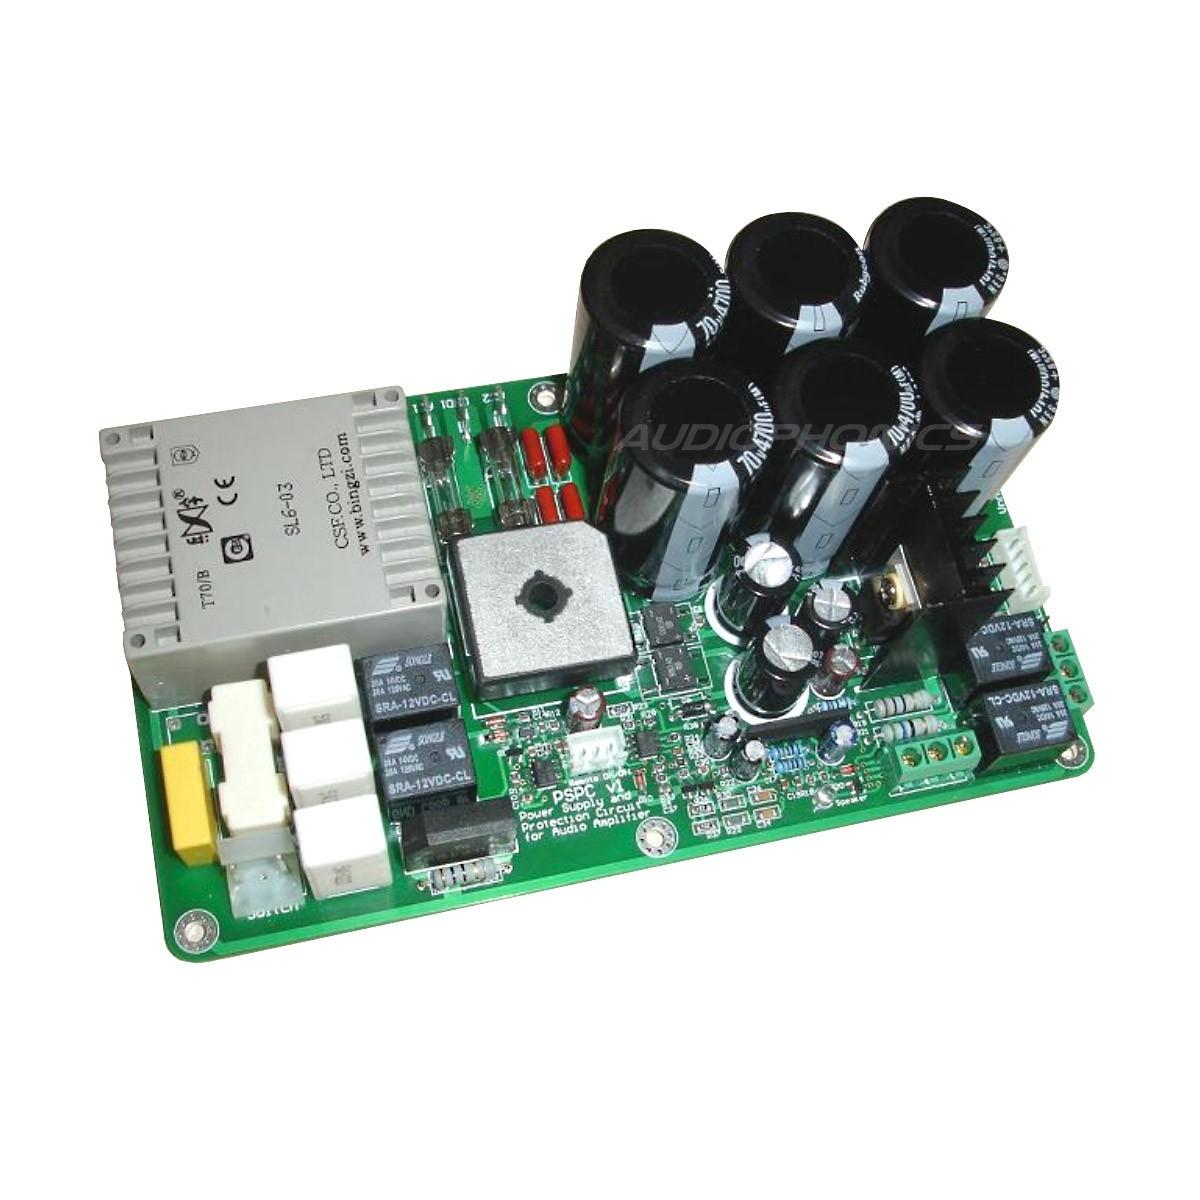 PSPC 230V Linear Power Supply & Speaker protection board (6x4700µF) +/-65V